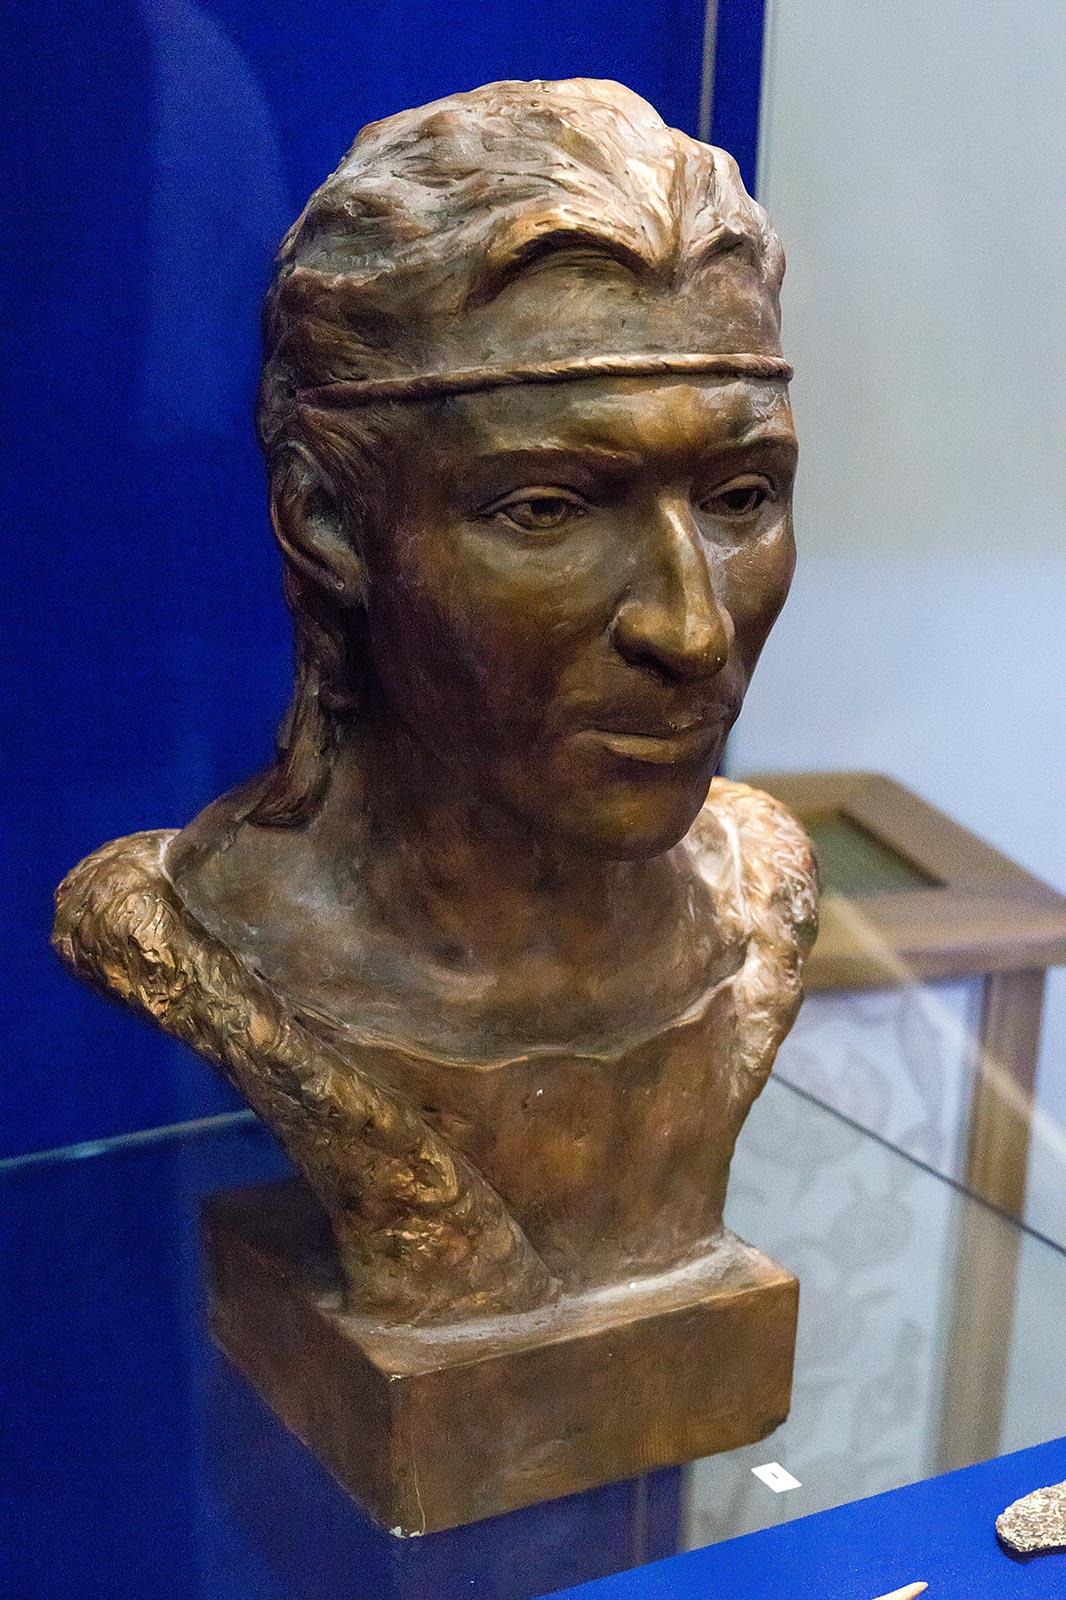 Фото №181921. Скульптура. Облик мужчины эпохи бронзы